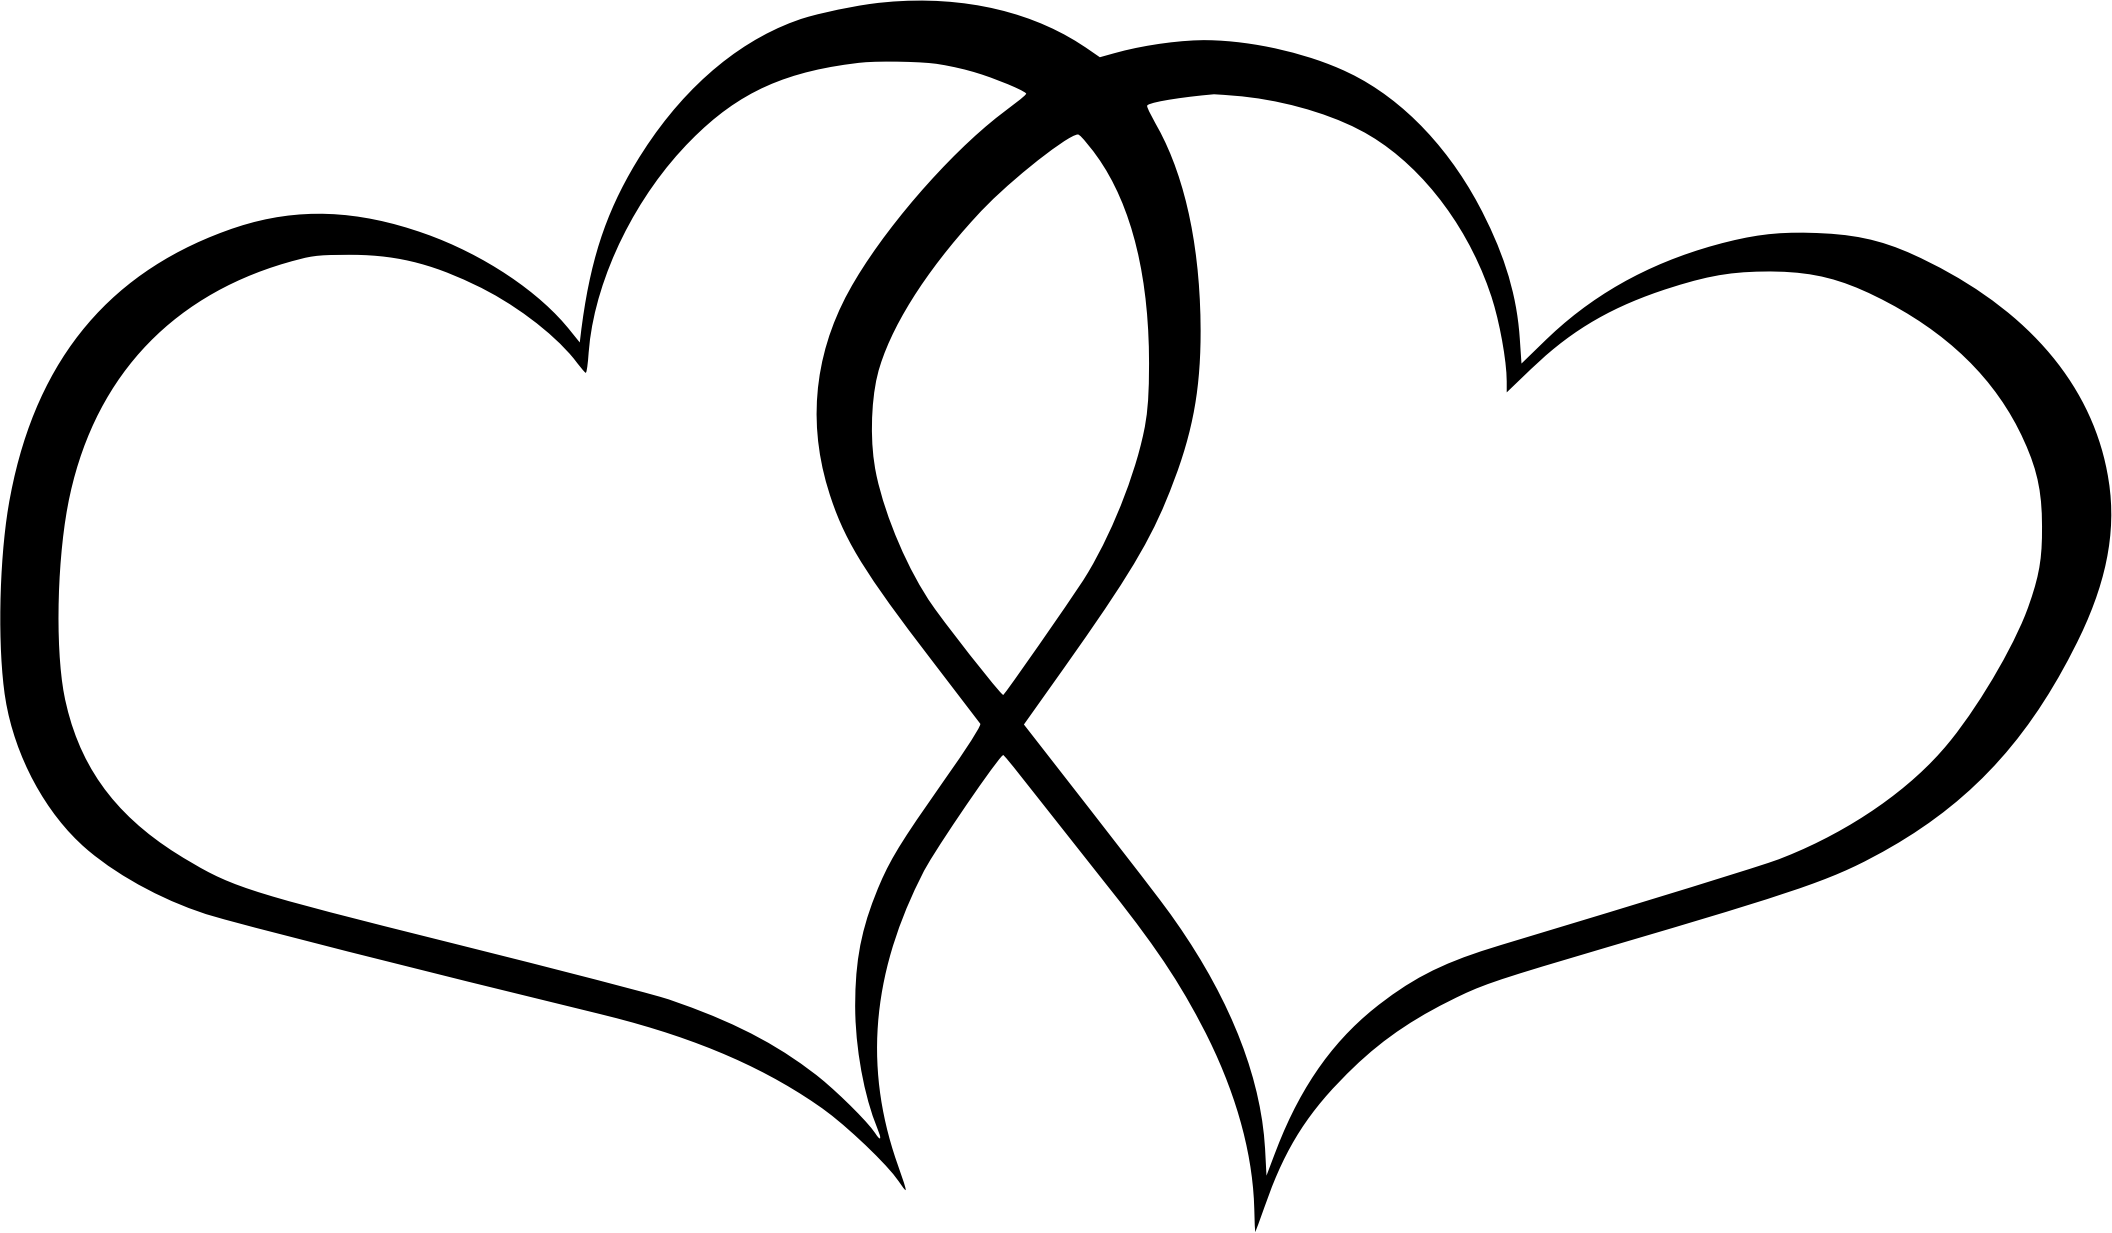 2112x1233 Clipart